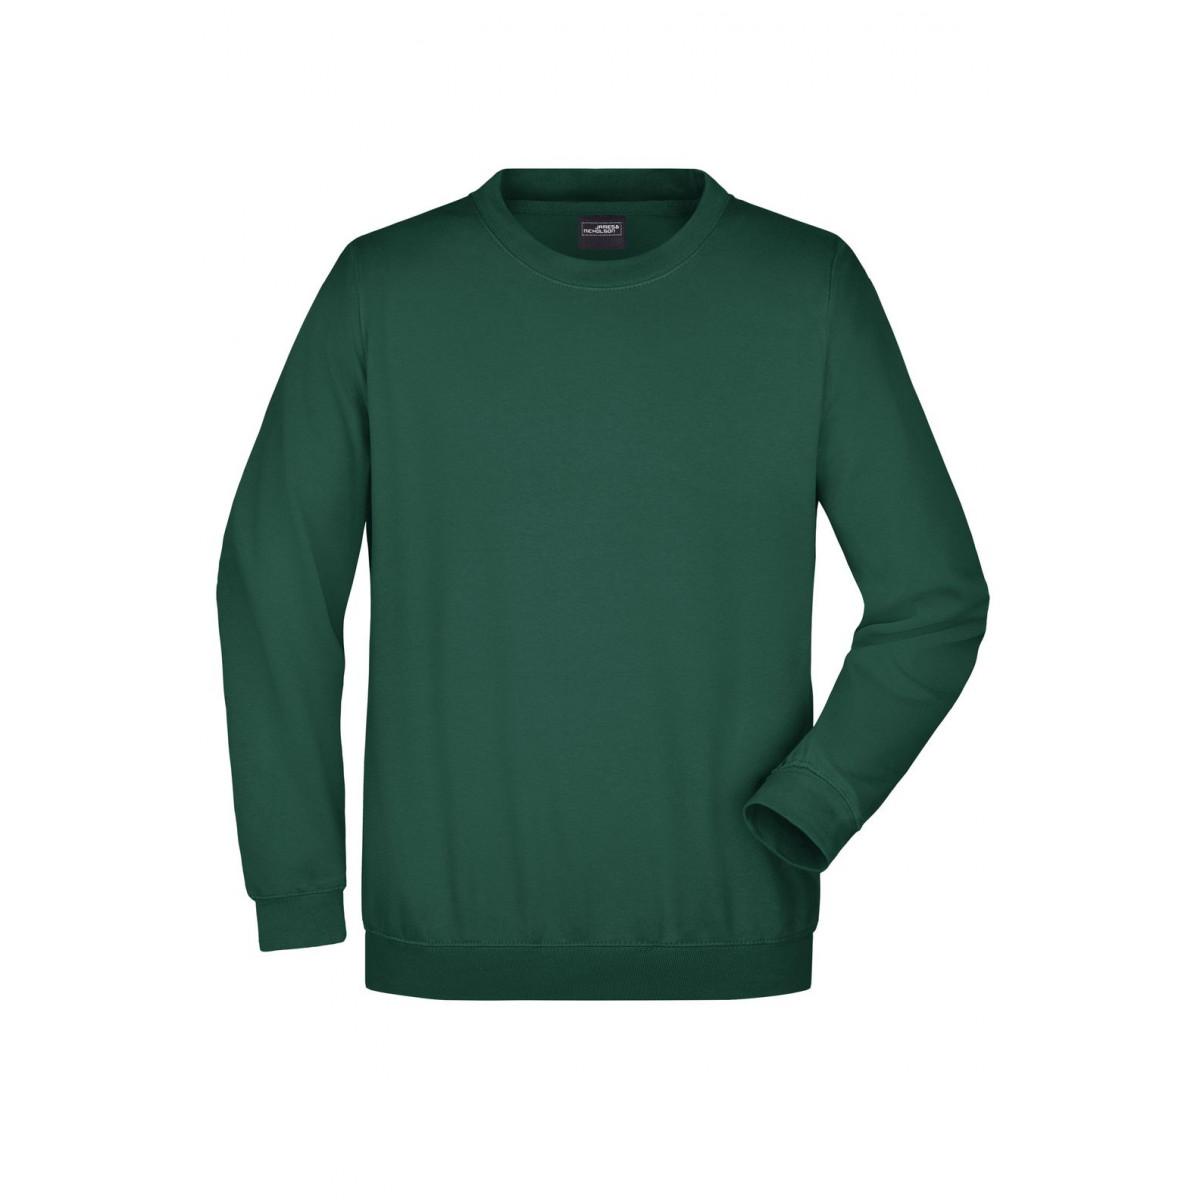 Толстовка мужская JN040 Round Sweat Heavy - Темно-зеленый